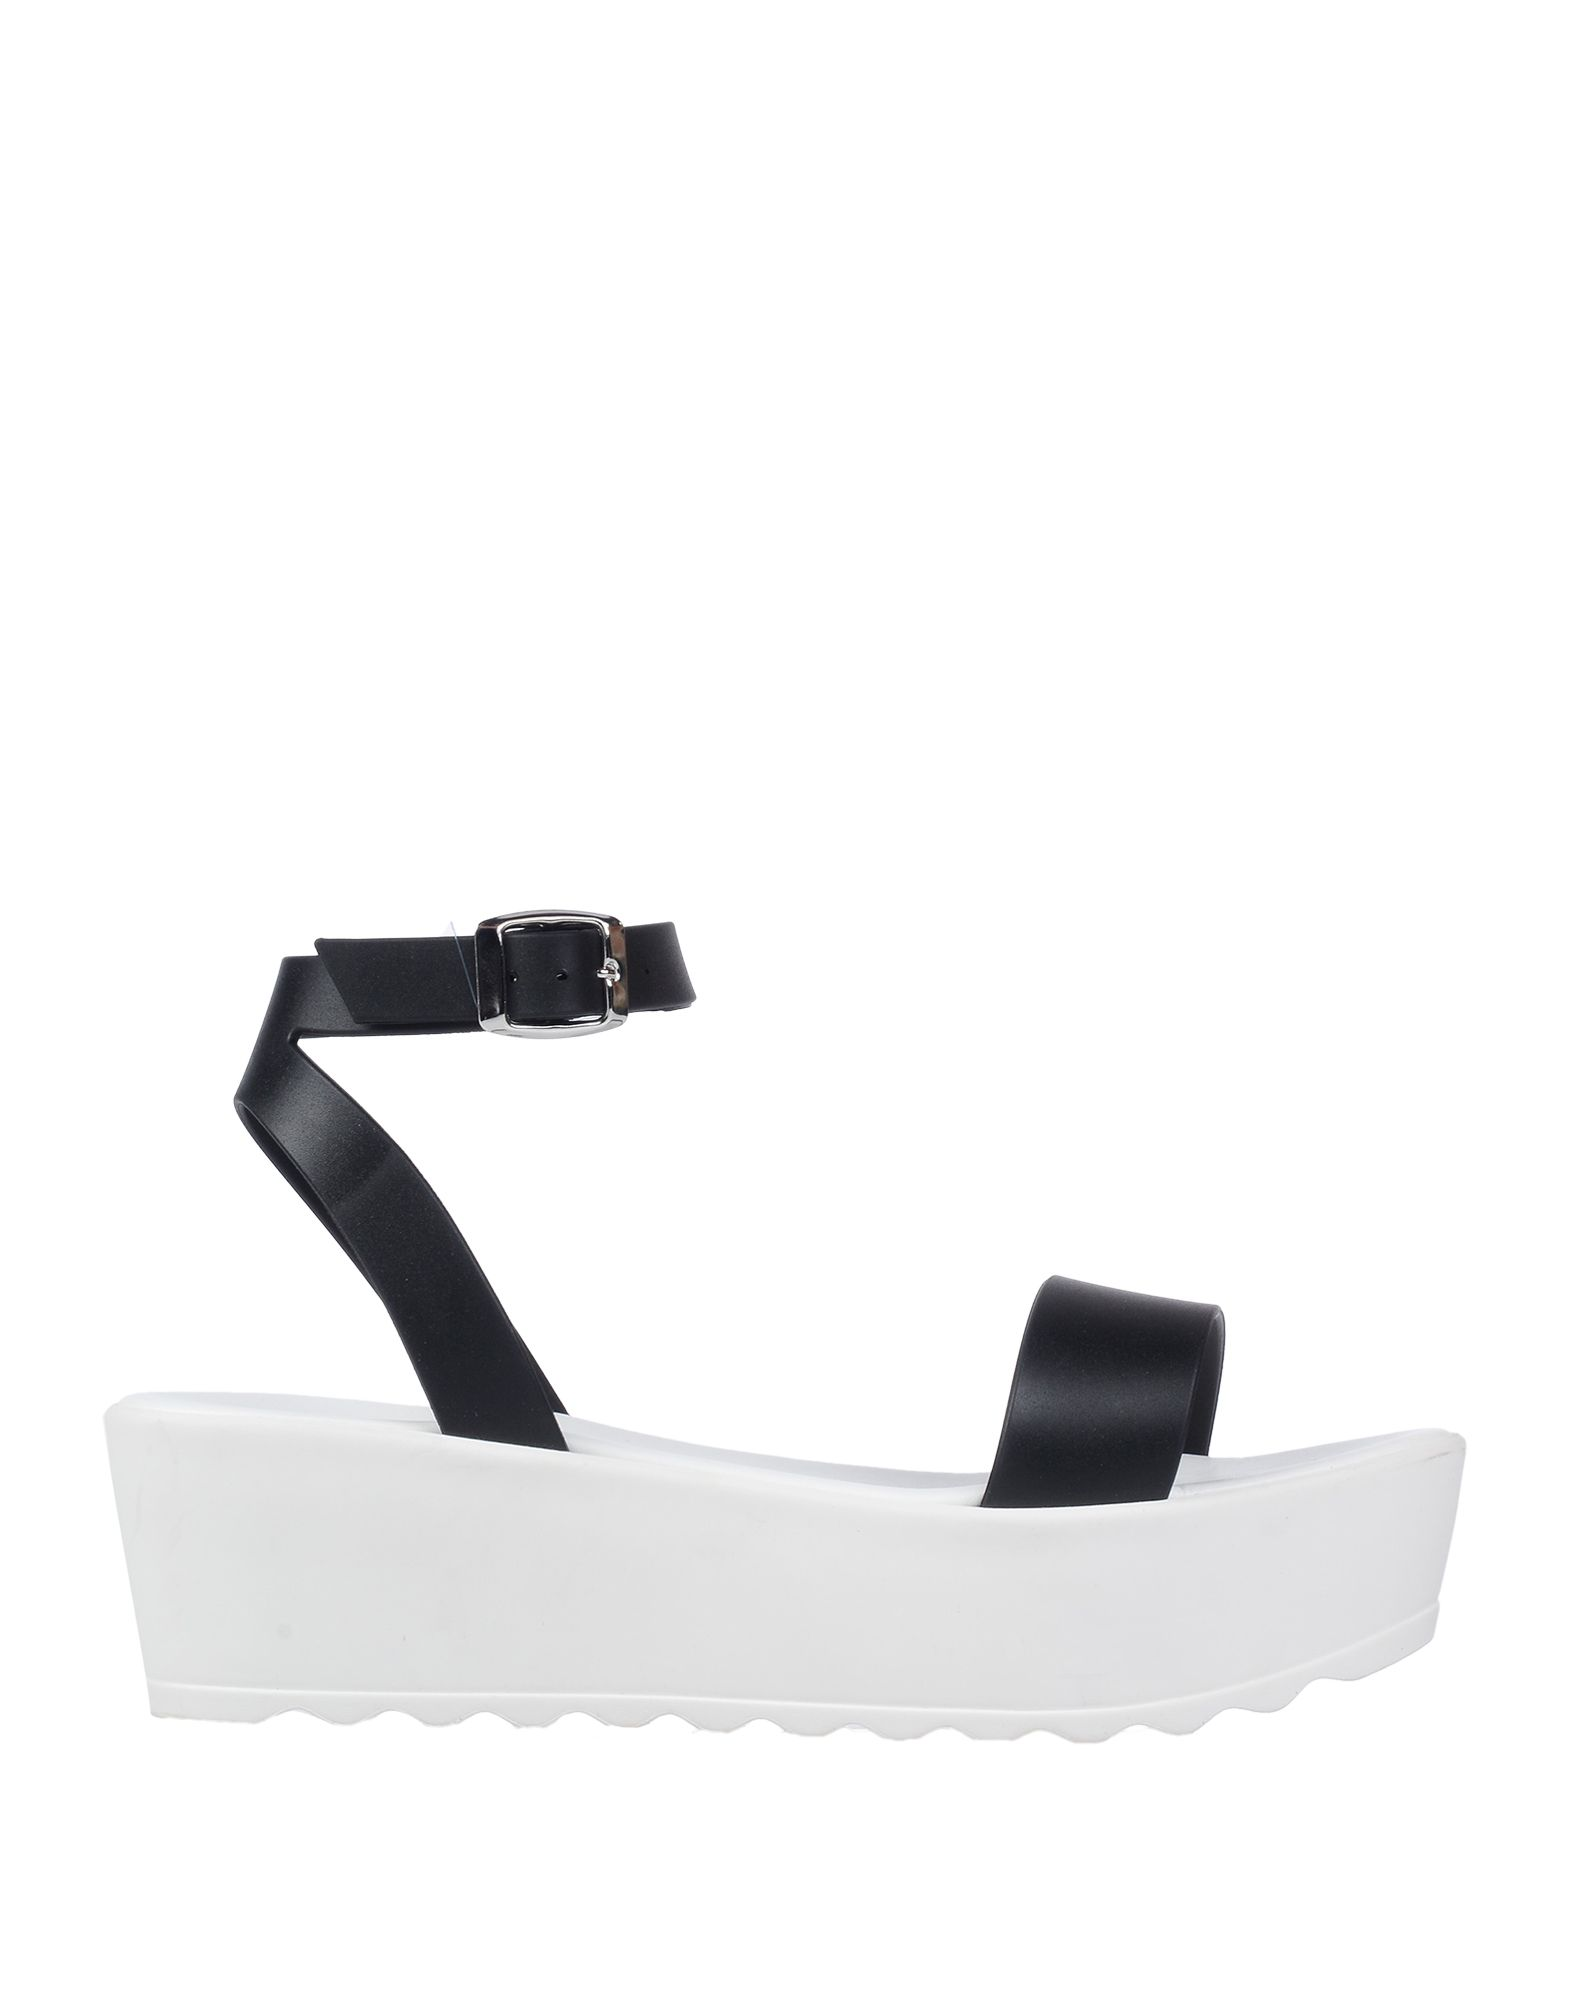 Stilvolle billige Schuhe Schuhe Schuhe Twin 11537411WE ccccb6